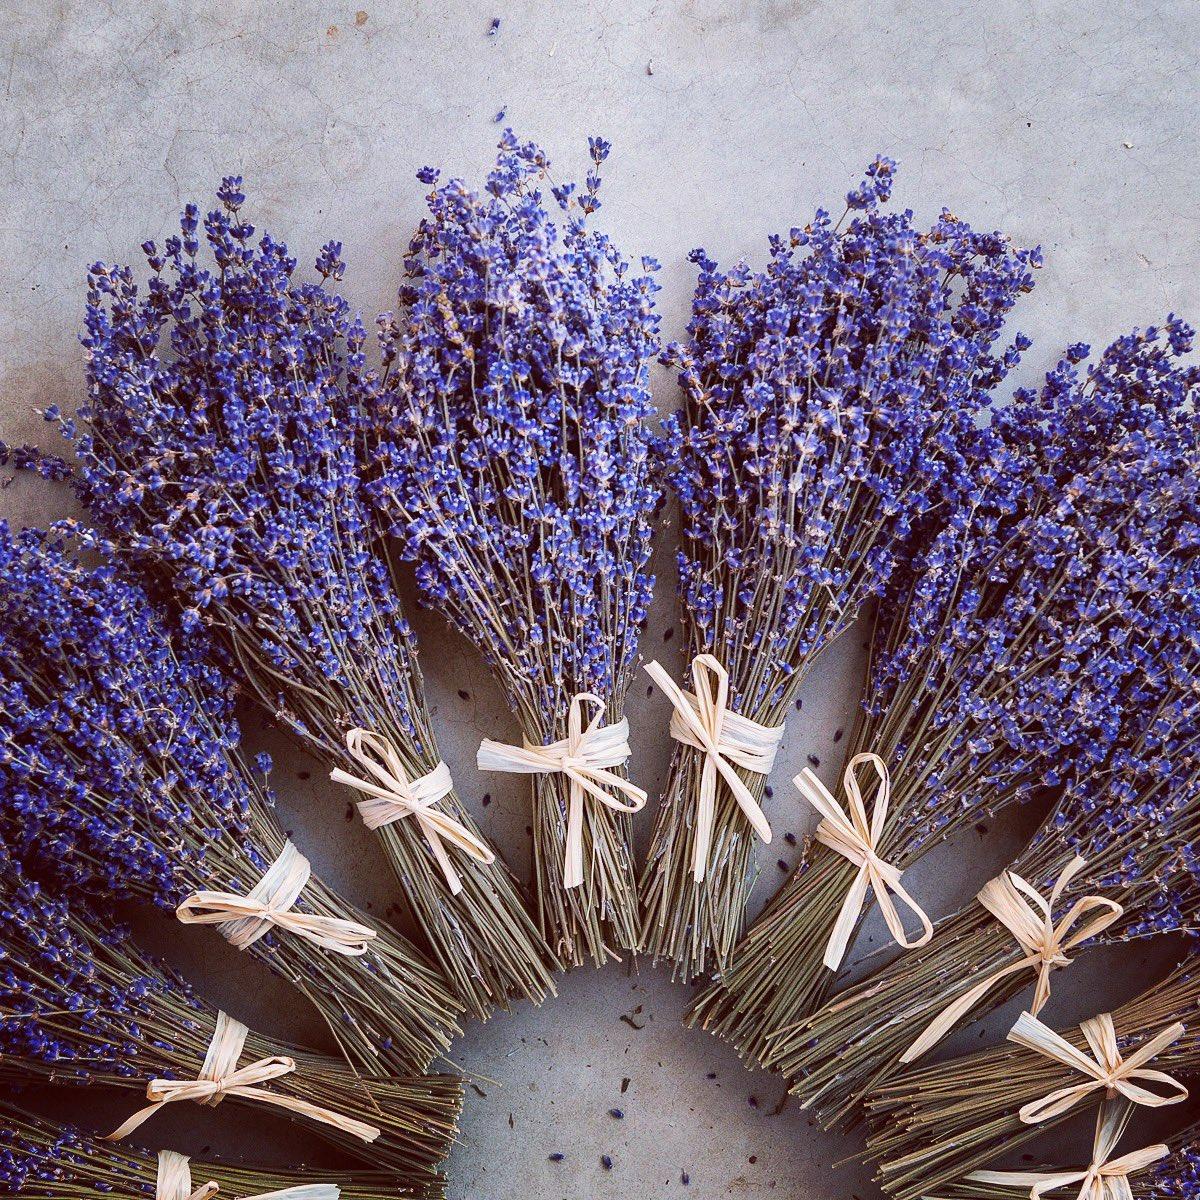 Terre Bleu Lavender Farm (@terrebleulav) | Twitter